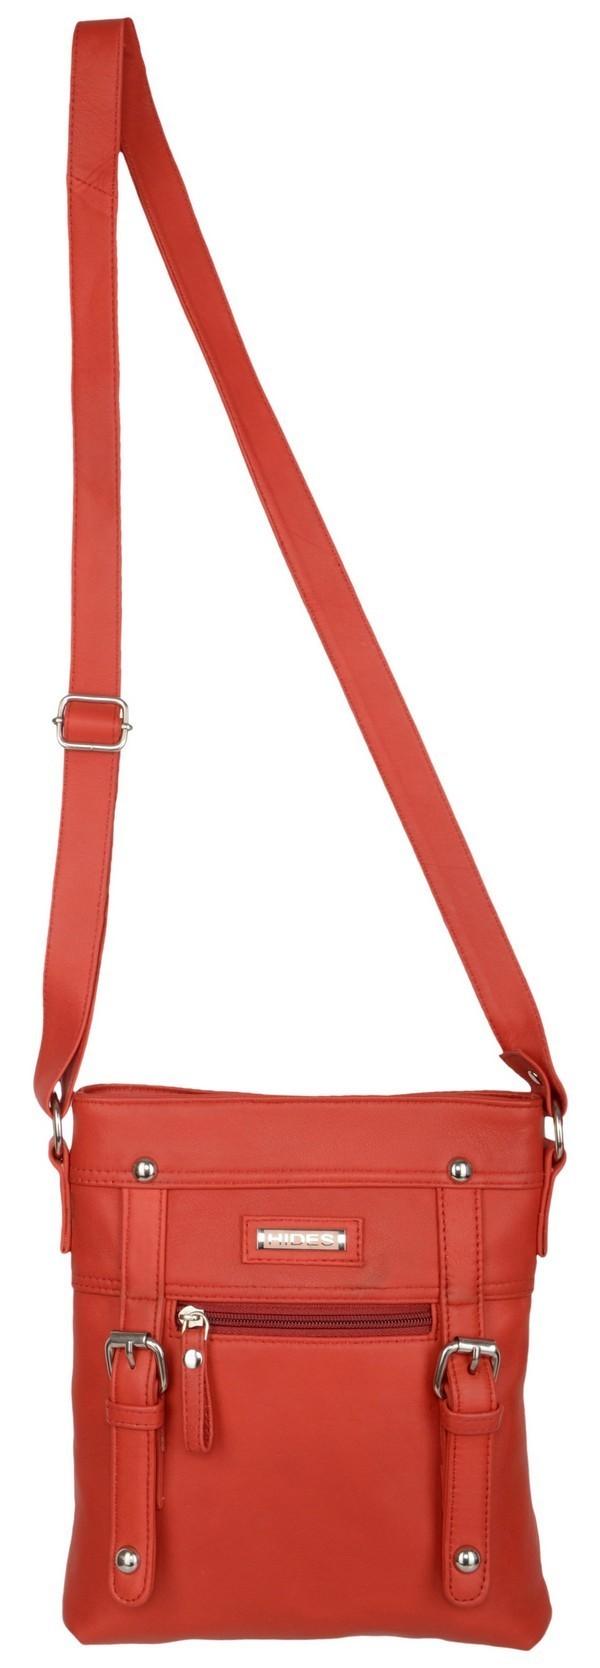 WOMEN RED SLING BAG